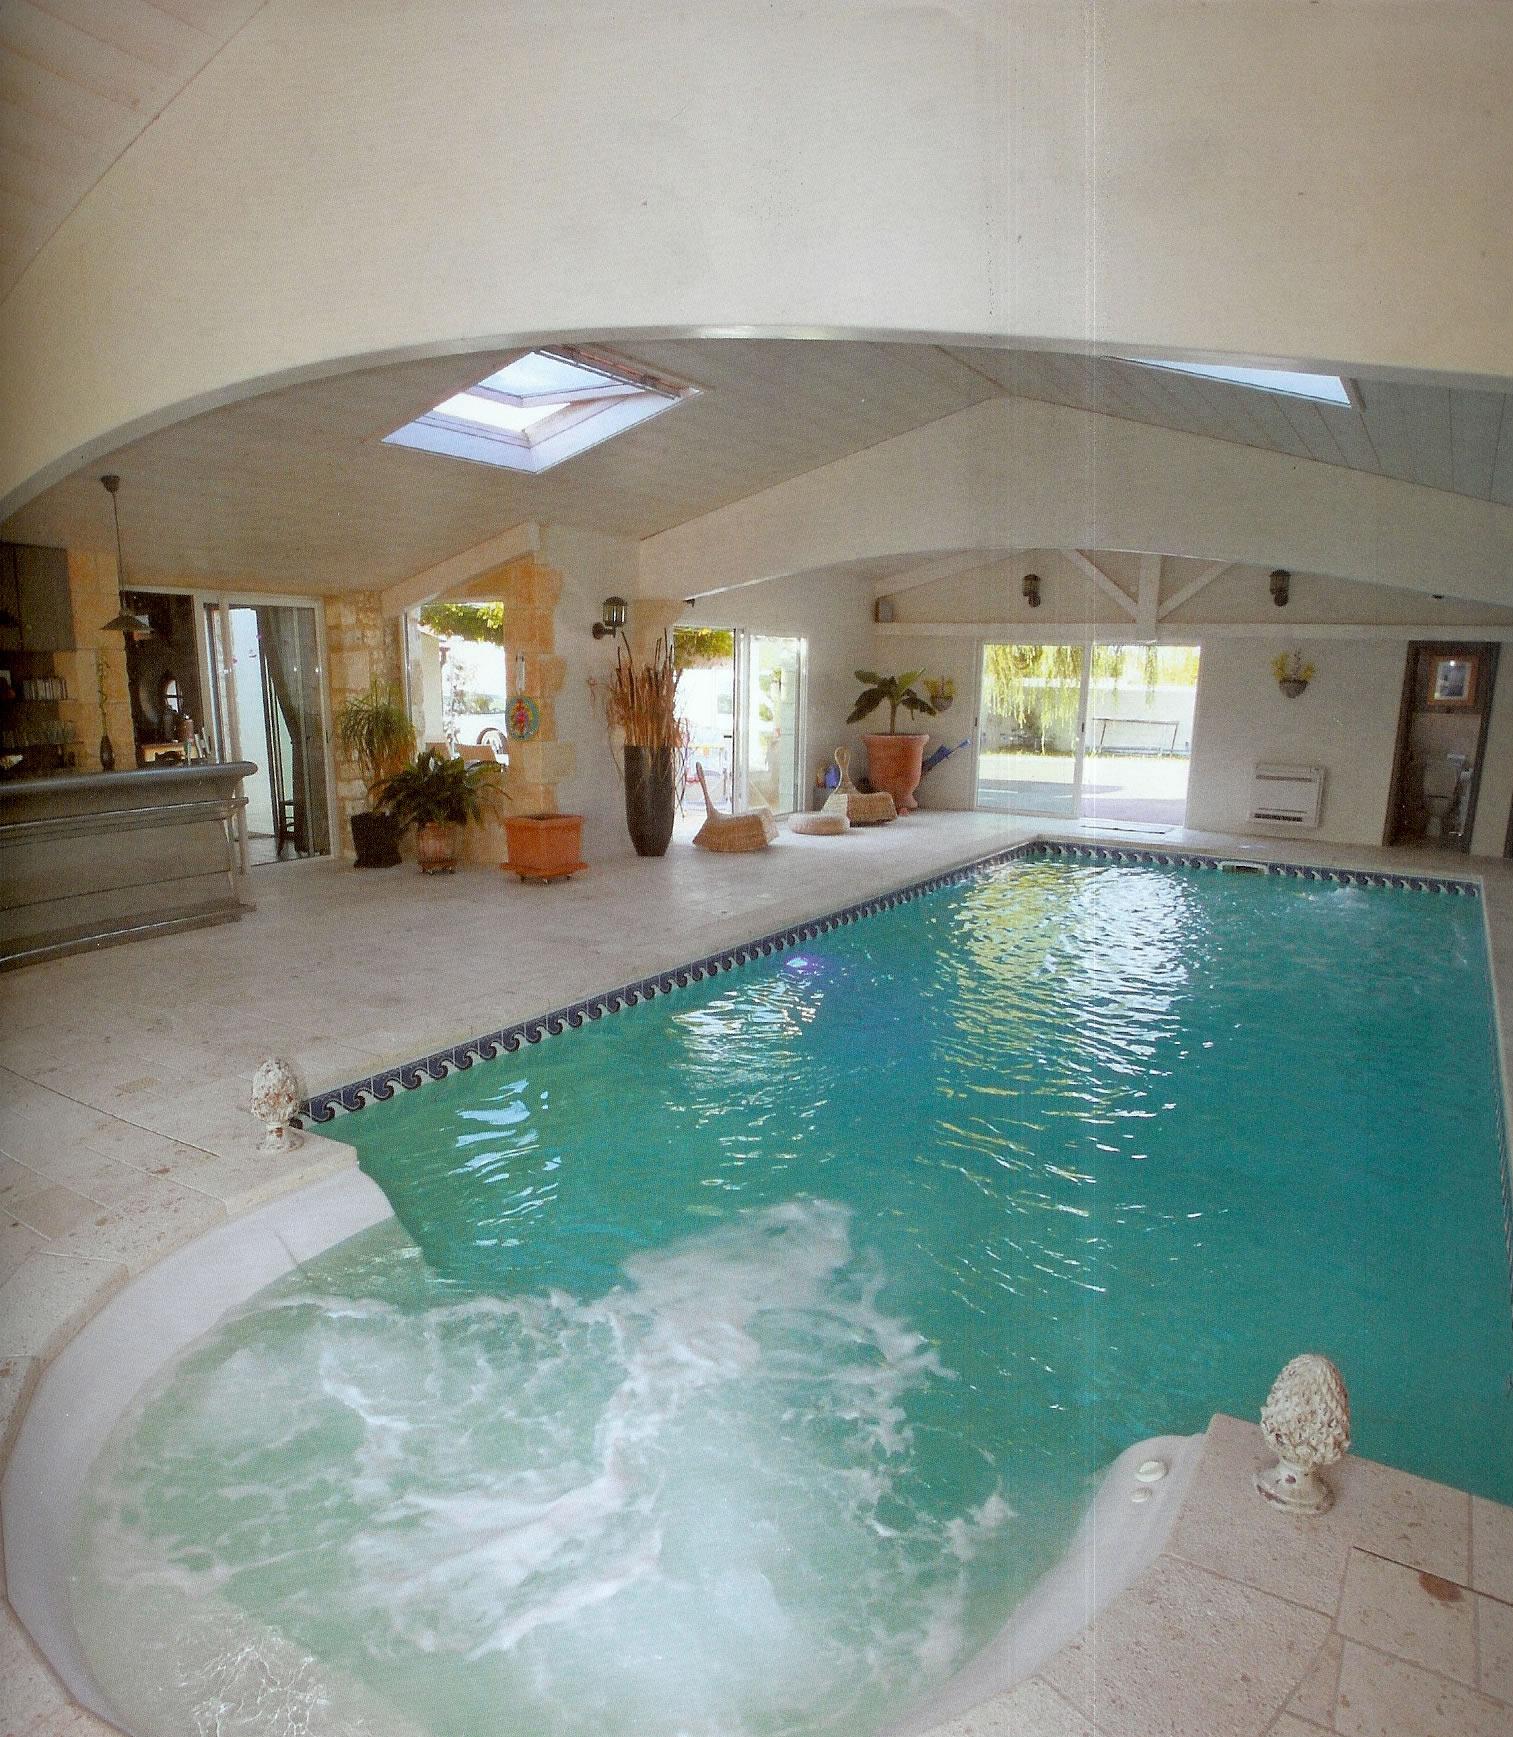 Luxury Home Plans With Indoor Pool: 20 Indoor, Luxury Pool Design & Pool Enclosure Ideas